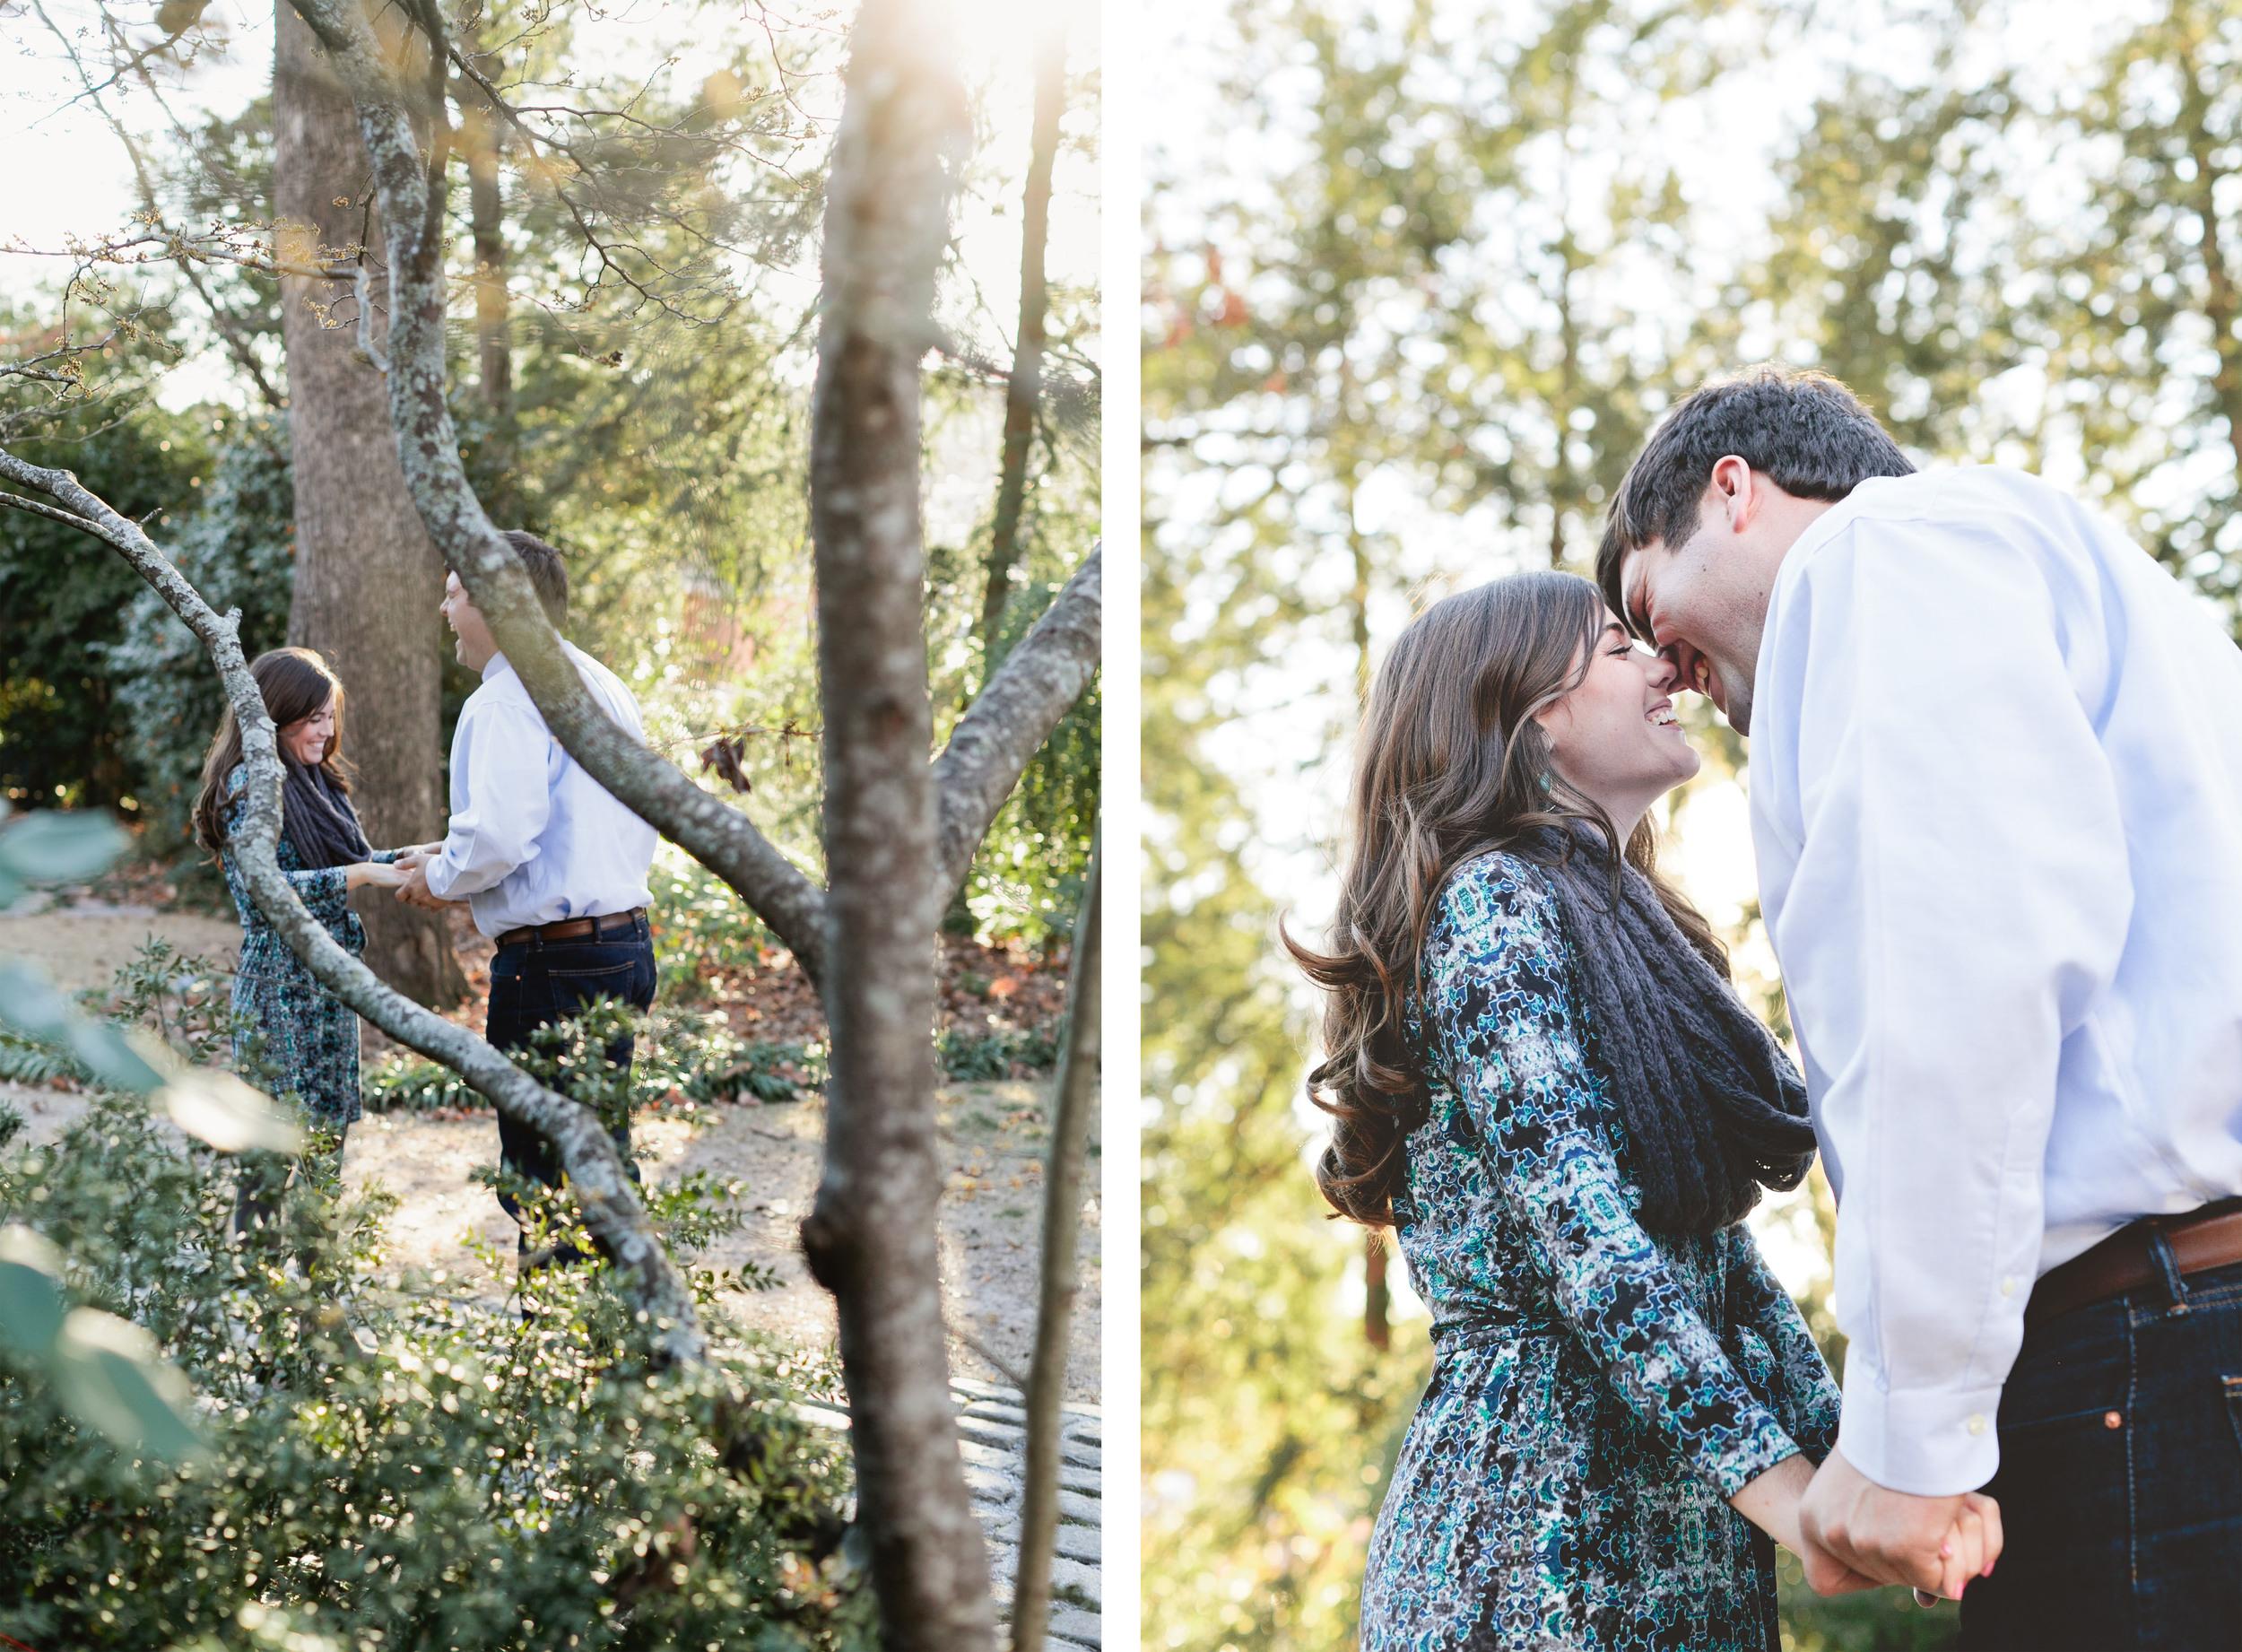 Atlanta-Engagement-Photographer-Kathryn-McCrary-Photography-Anna-Lynn-Raleigh-Collage-5.jpg